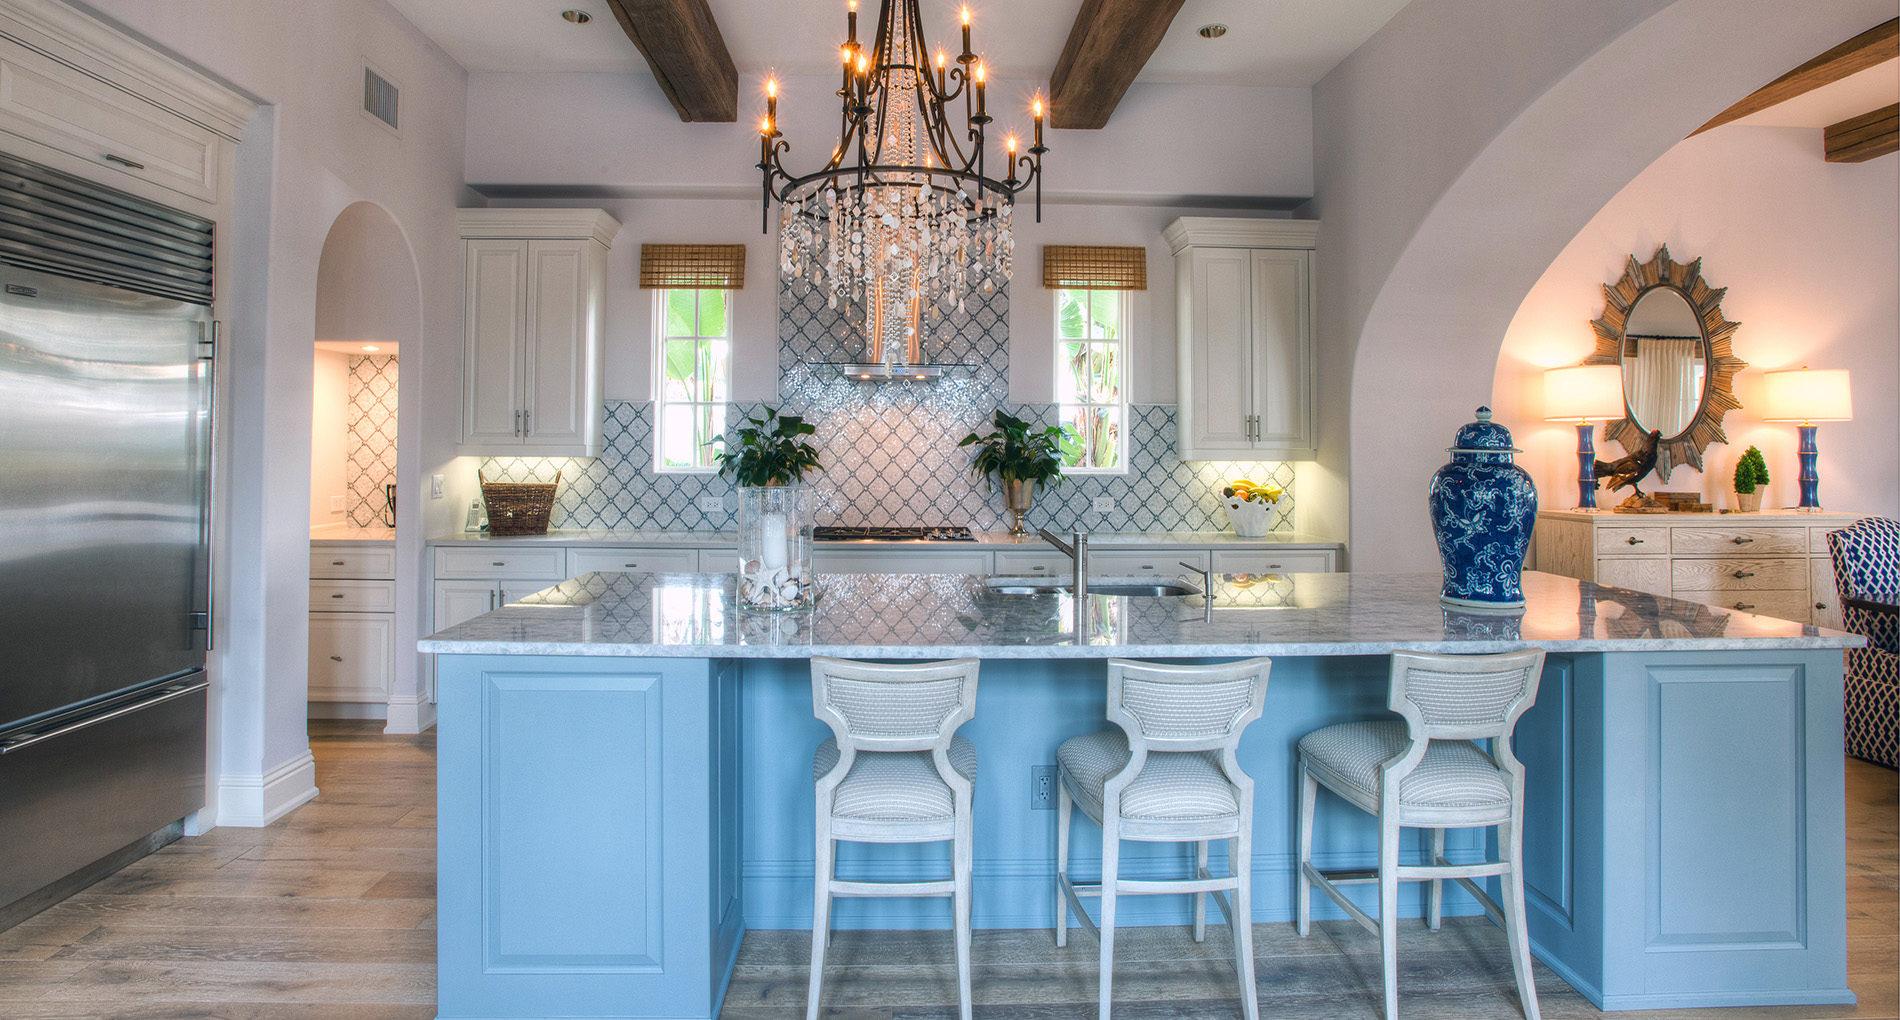 Kitchen Remodeling & Design in Bonita Springs, FL | Alair Homes ...